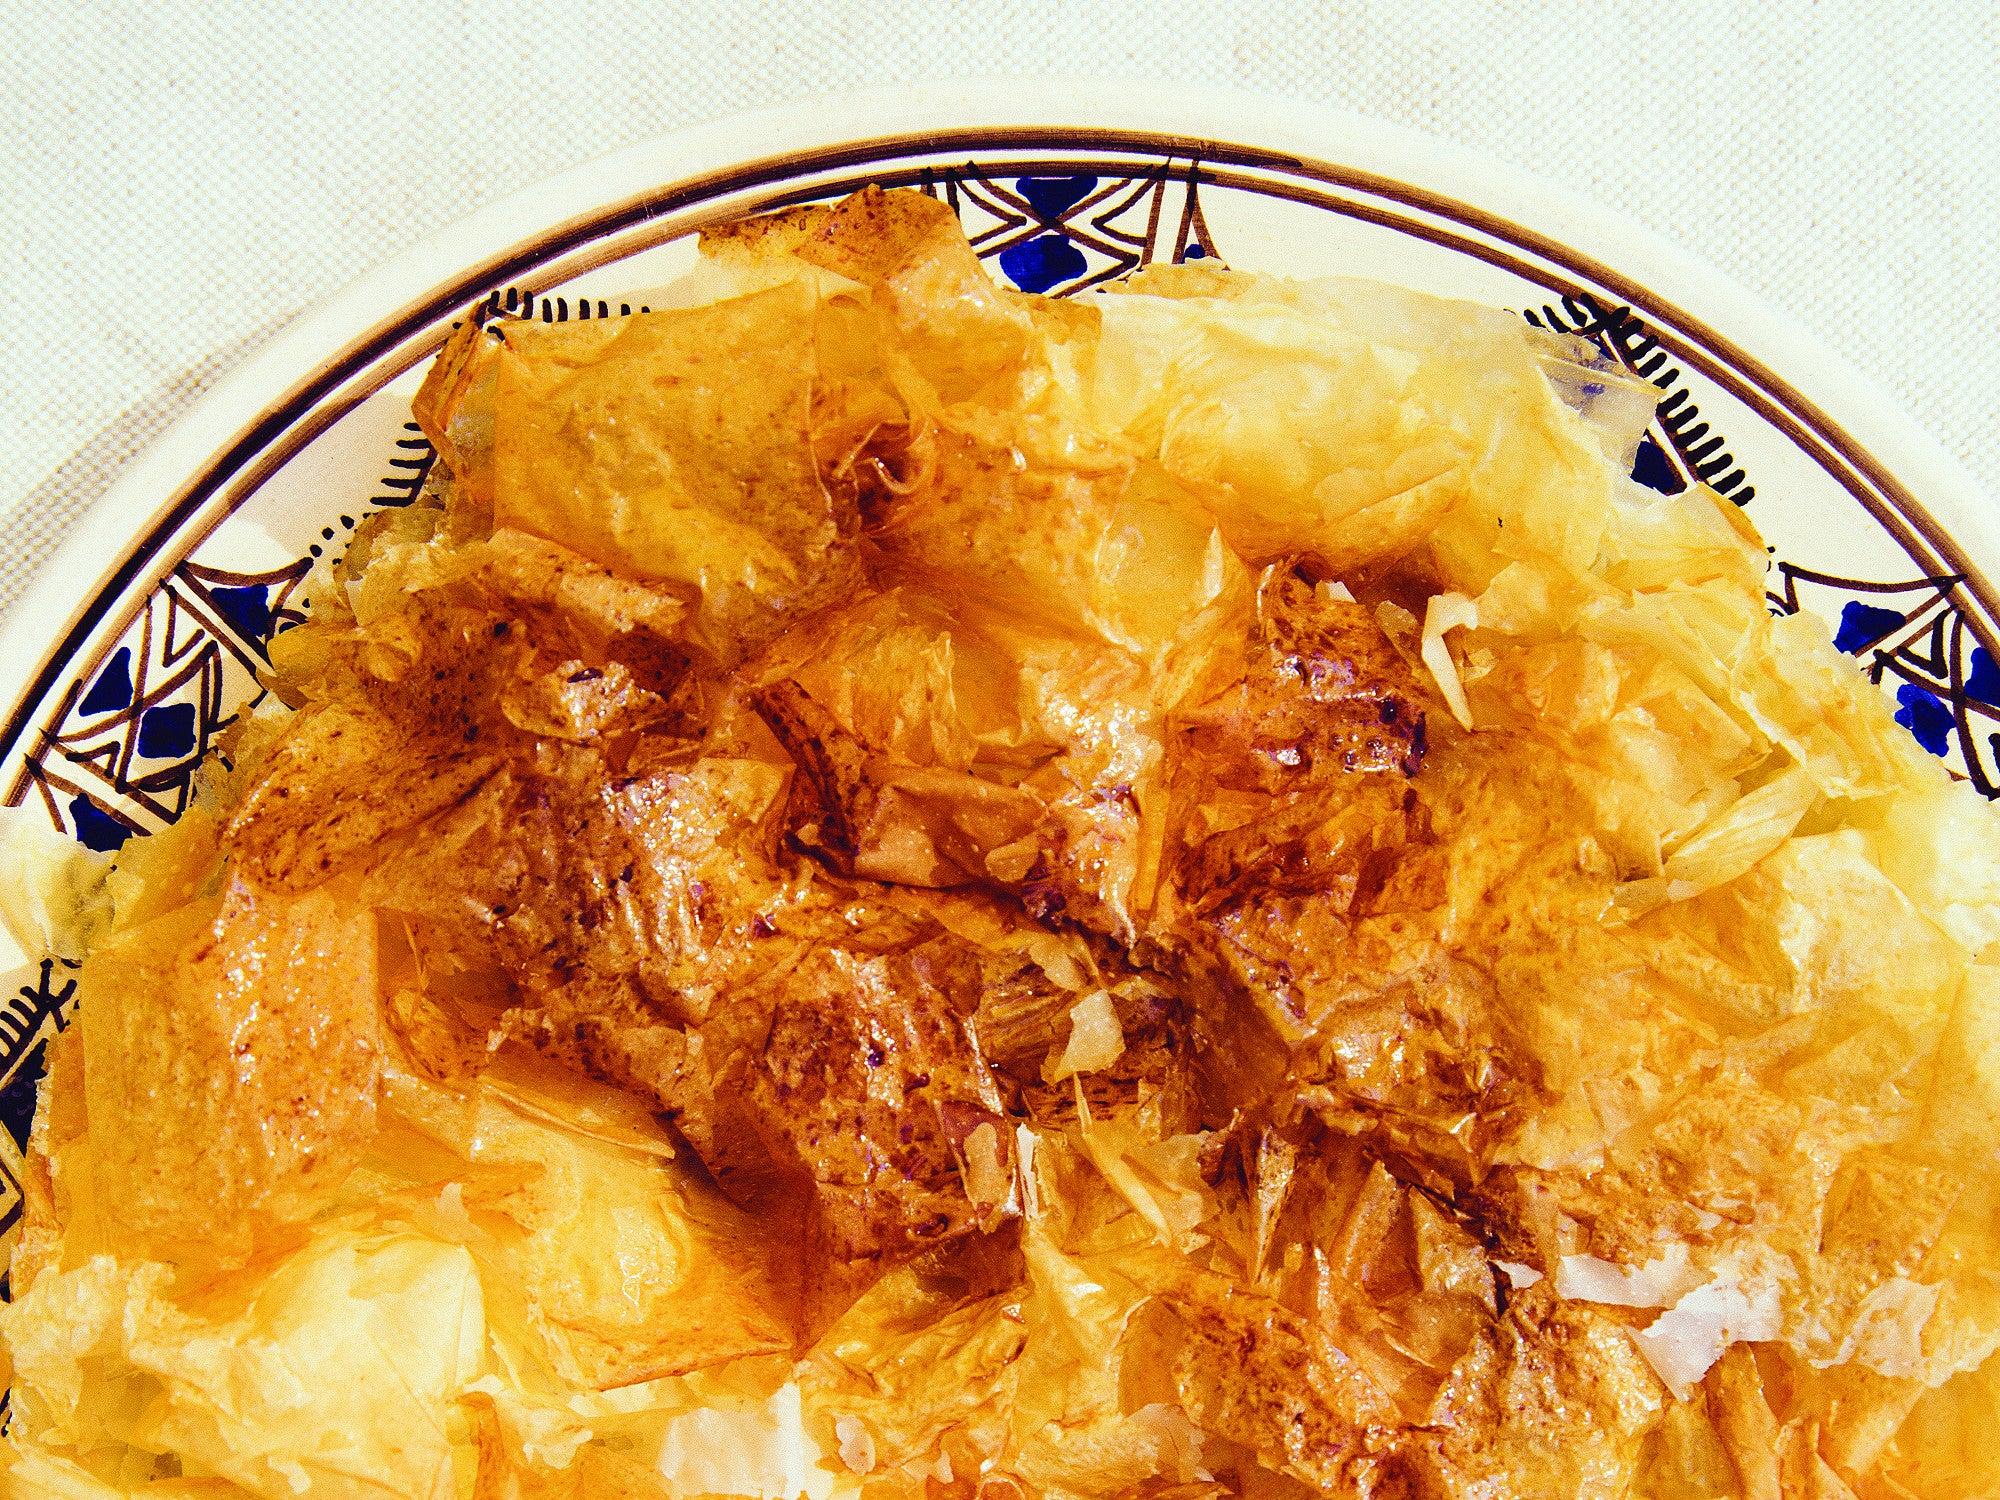 Apple and Armagnac Phyllo Pie